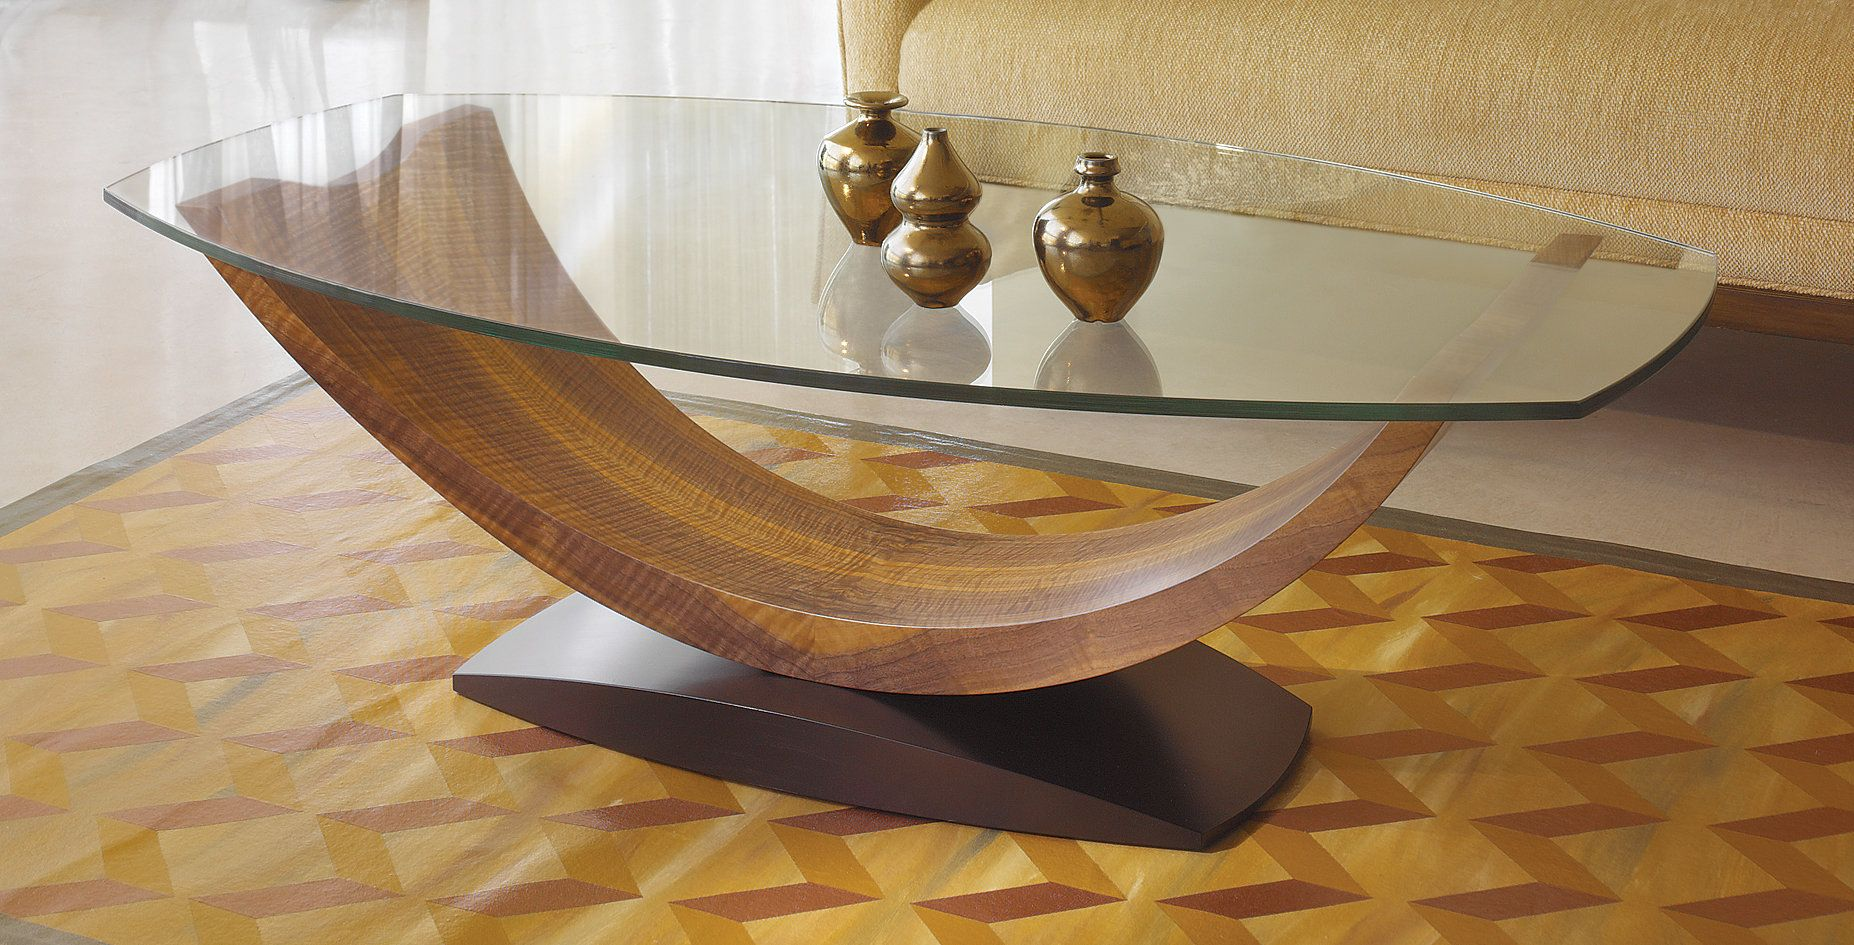 Arc coffee table by enrico konig wood coffee table in